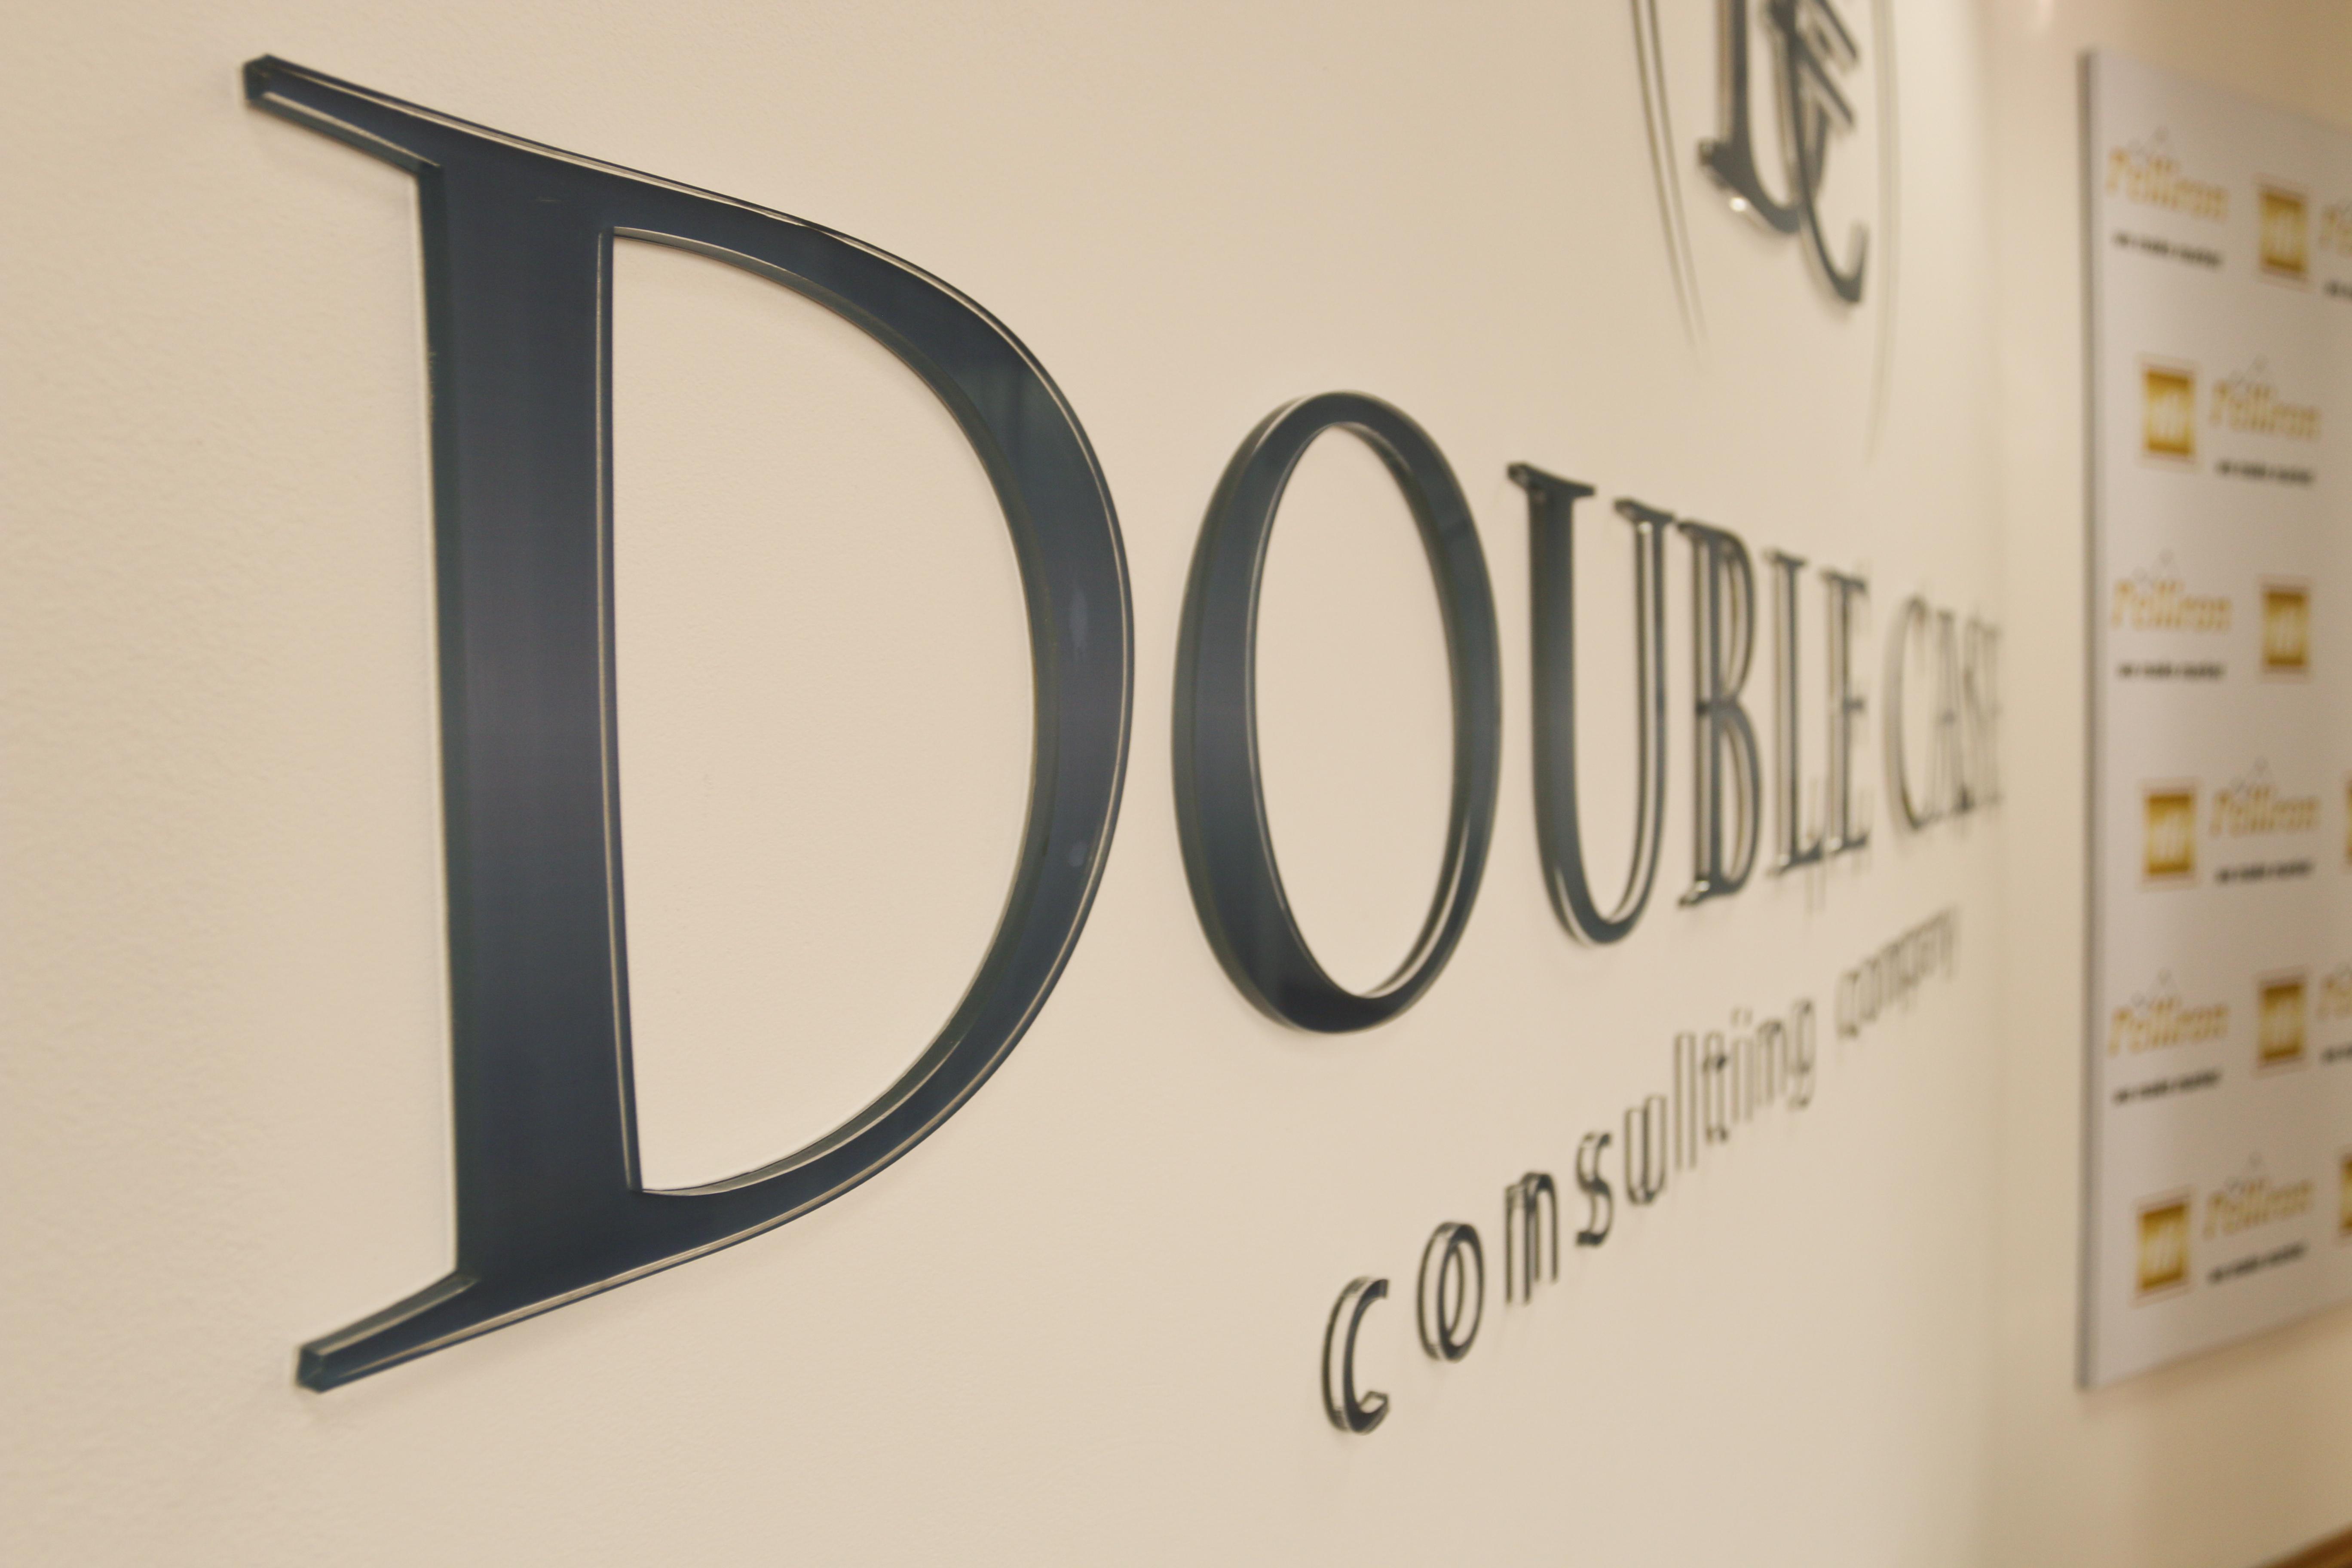 Double Case обучение